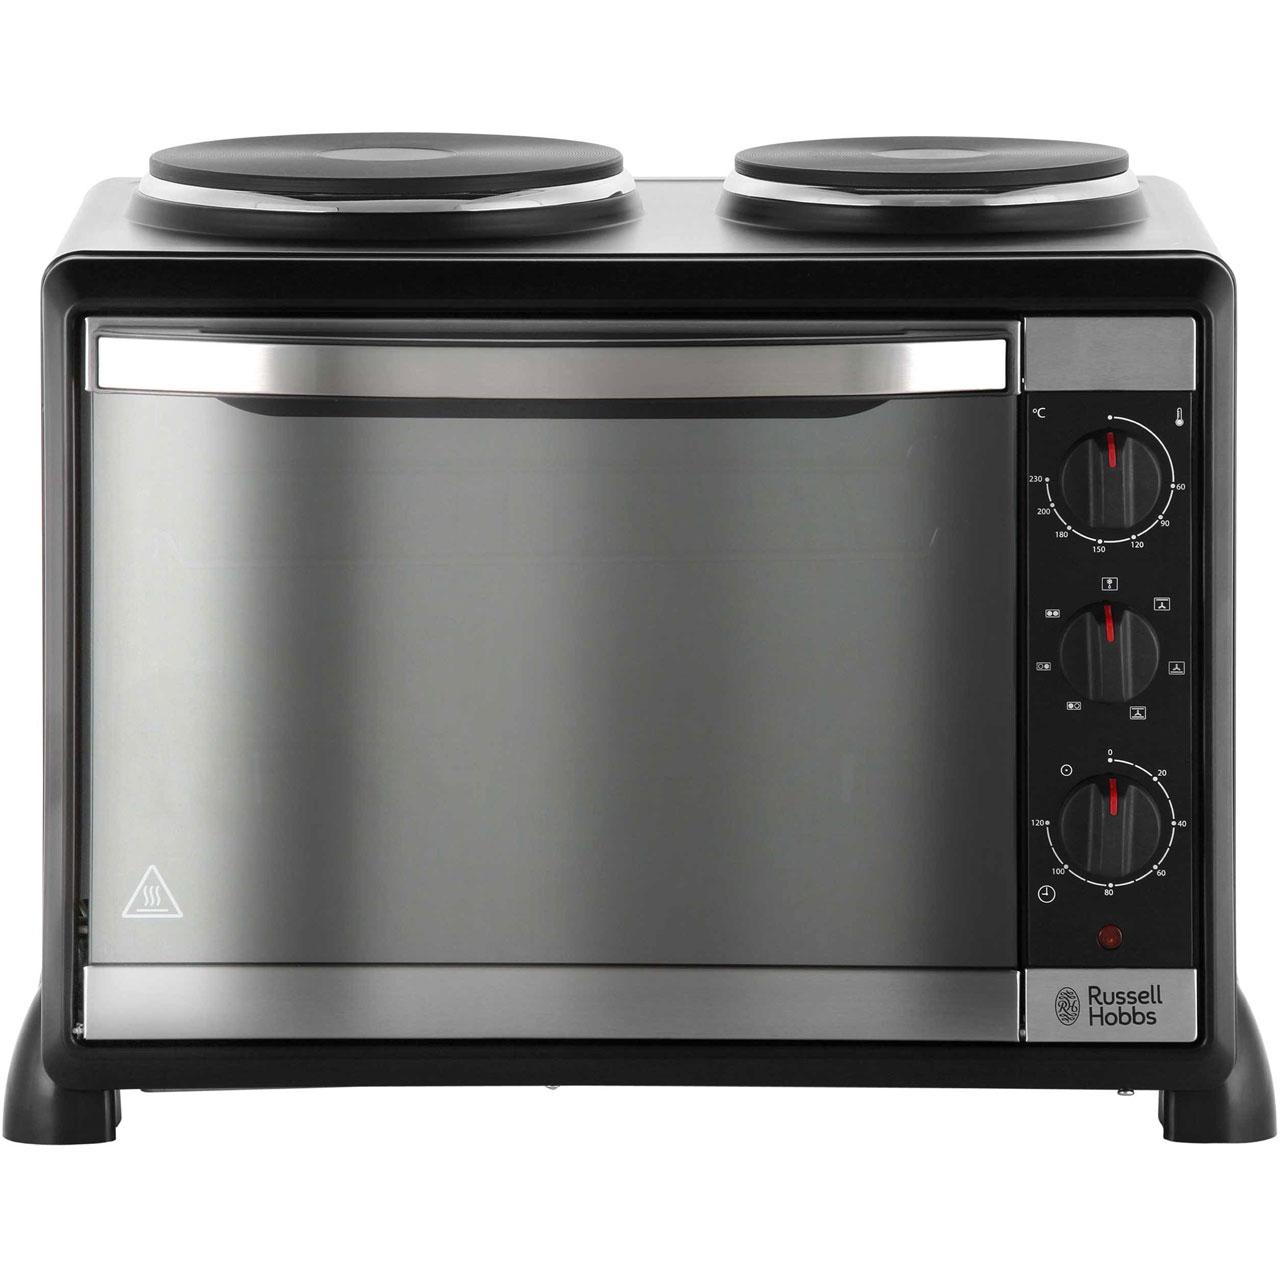 Russell Hobbs Mini Kitchen 22780 Mini Oven - Black